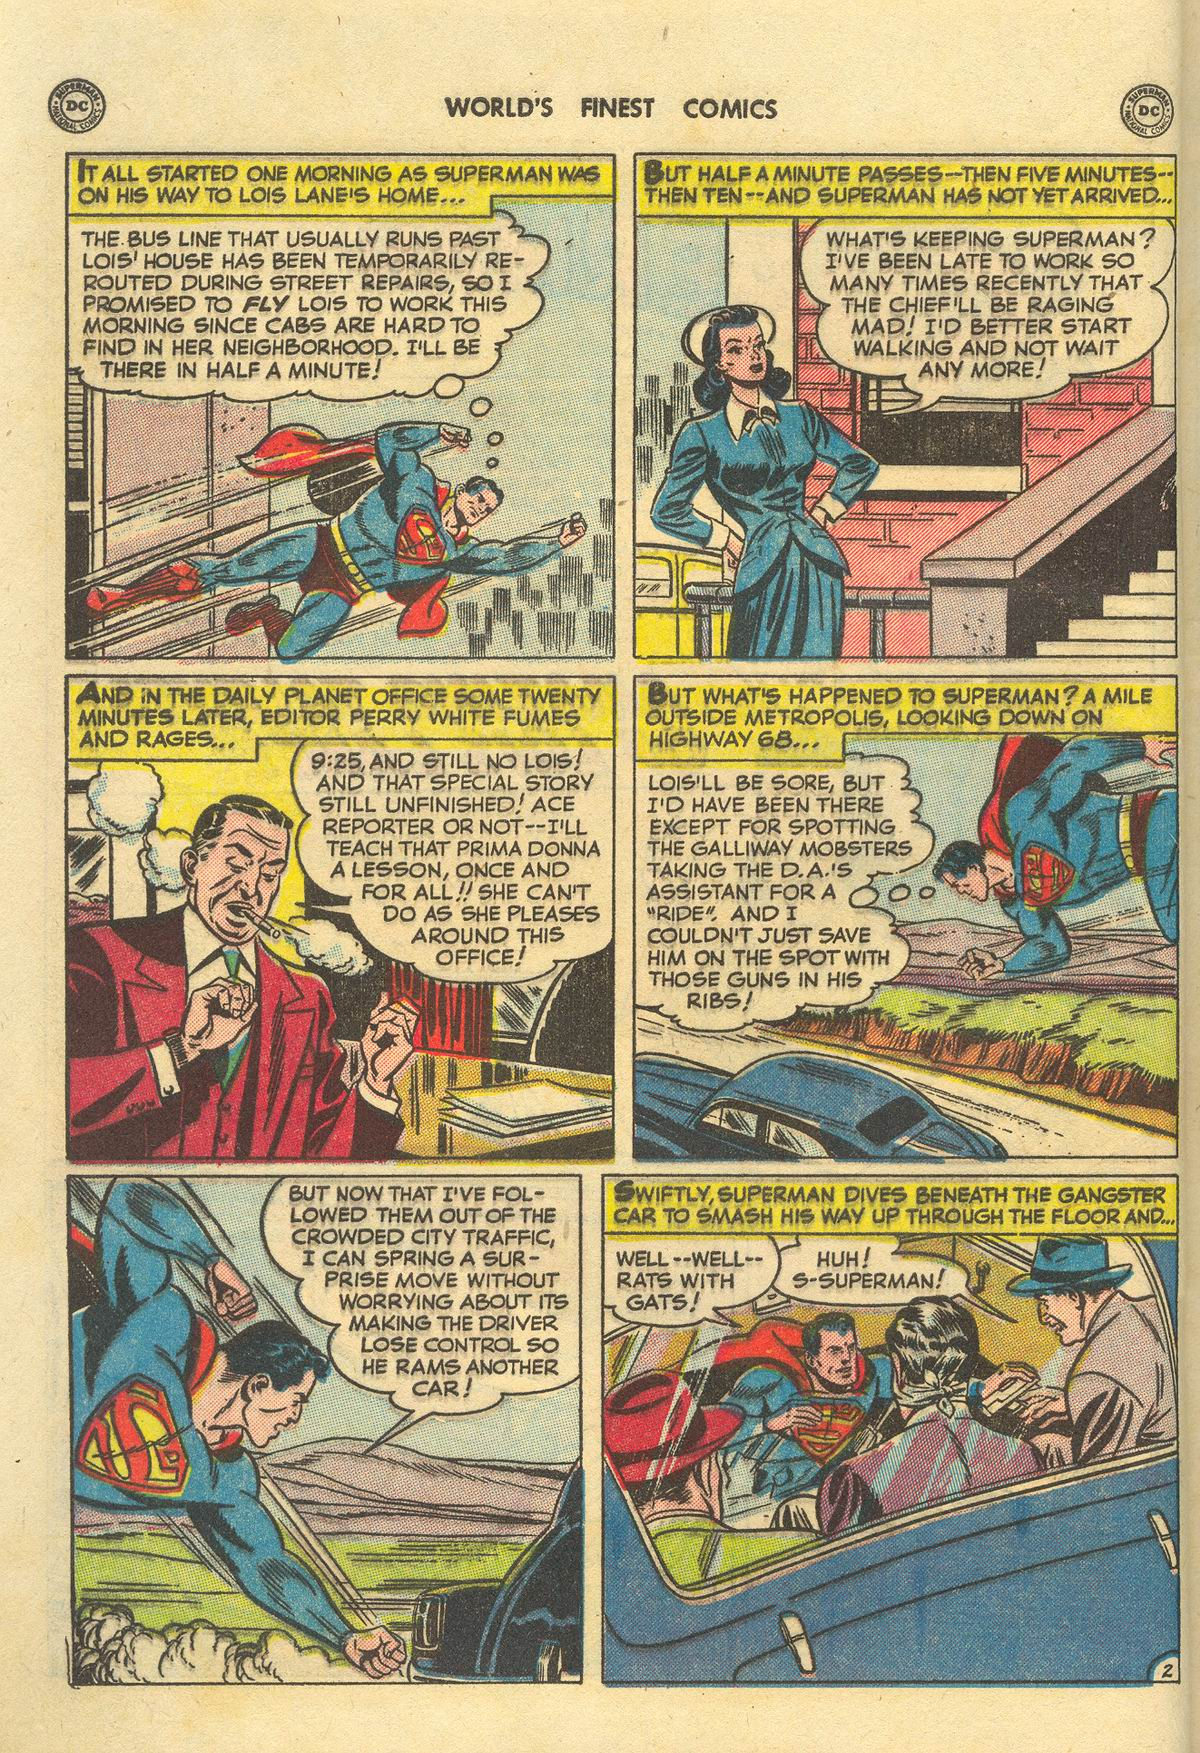 Read online World's Finest Comics comic -  Issue #51 - 4